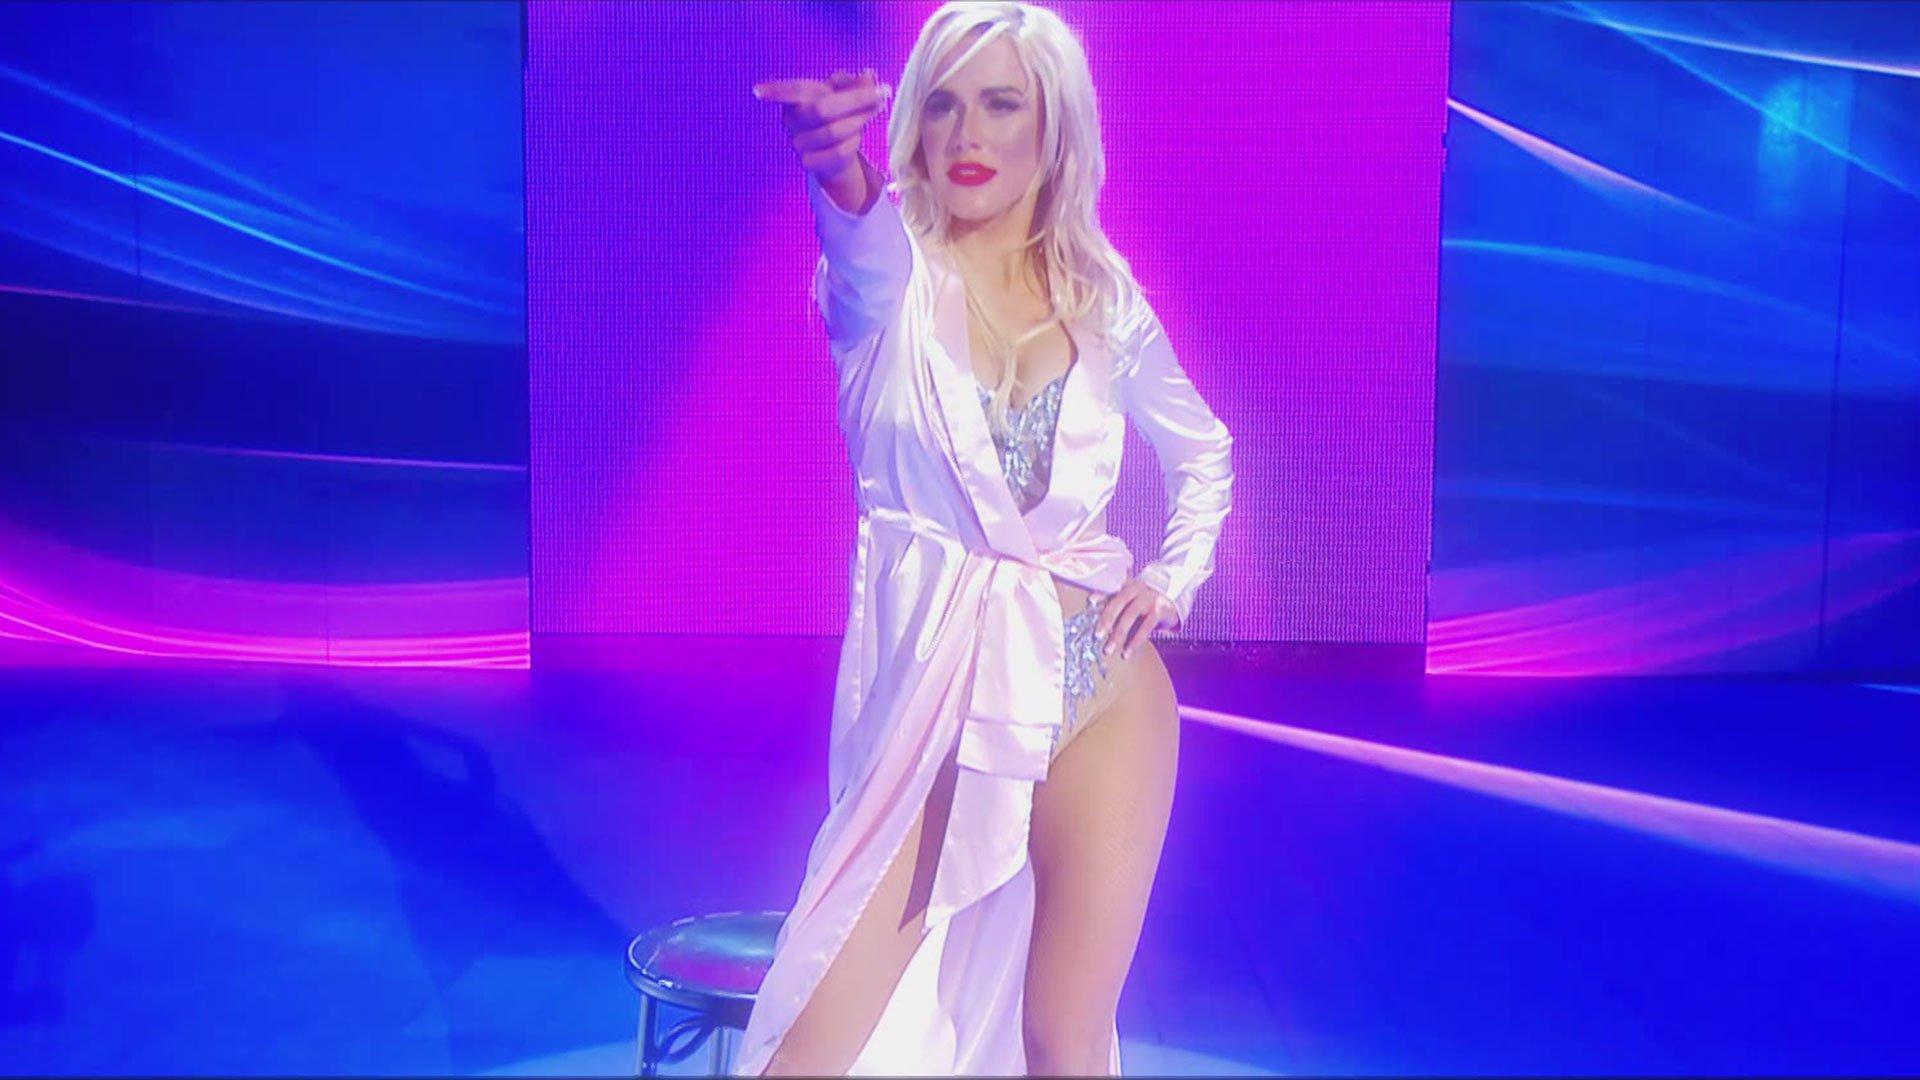 Lana zmierza na SmackDown: SmackDown LIVE 18.04.17